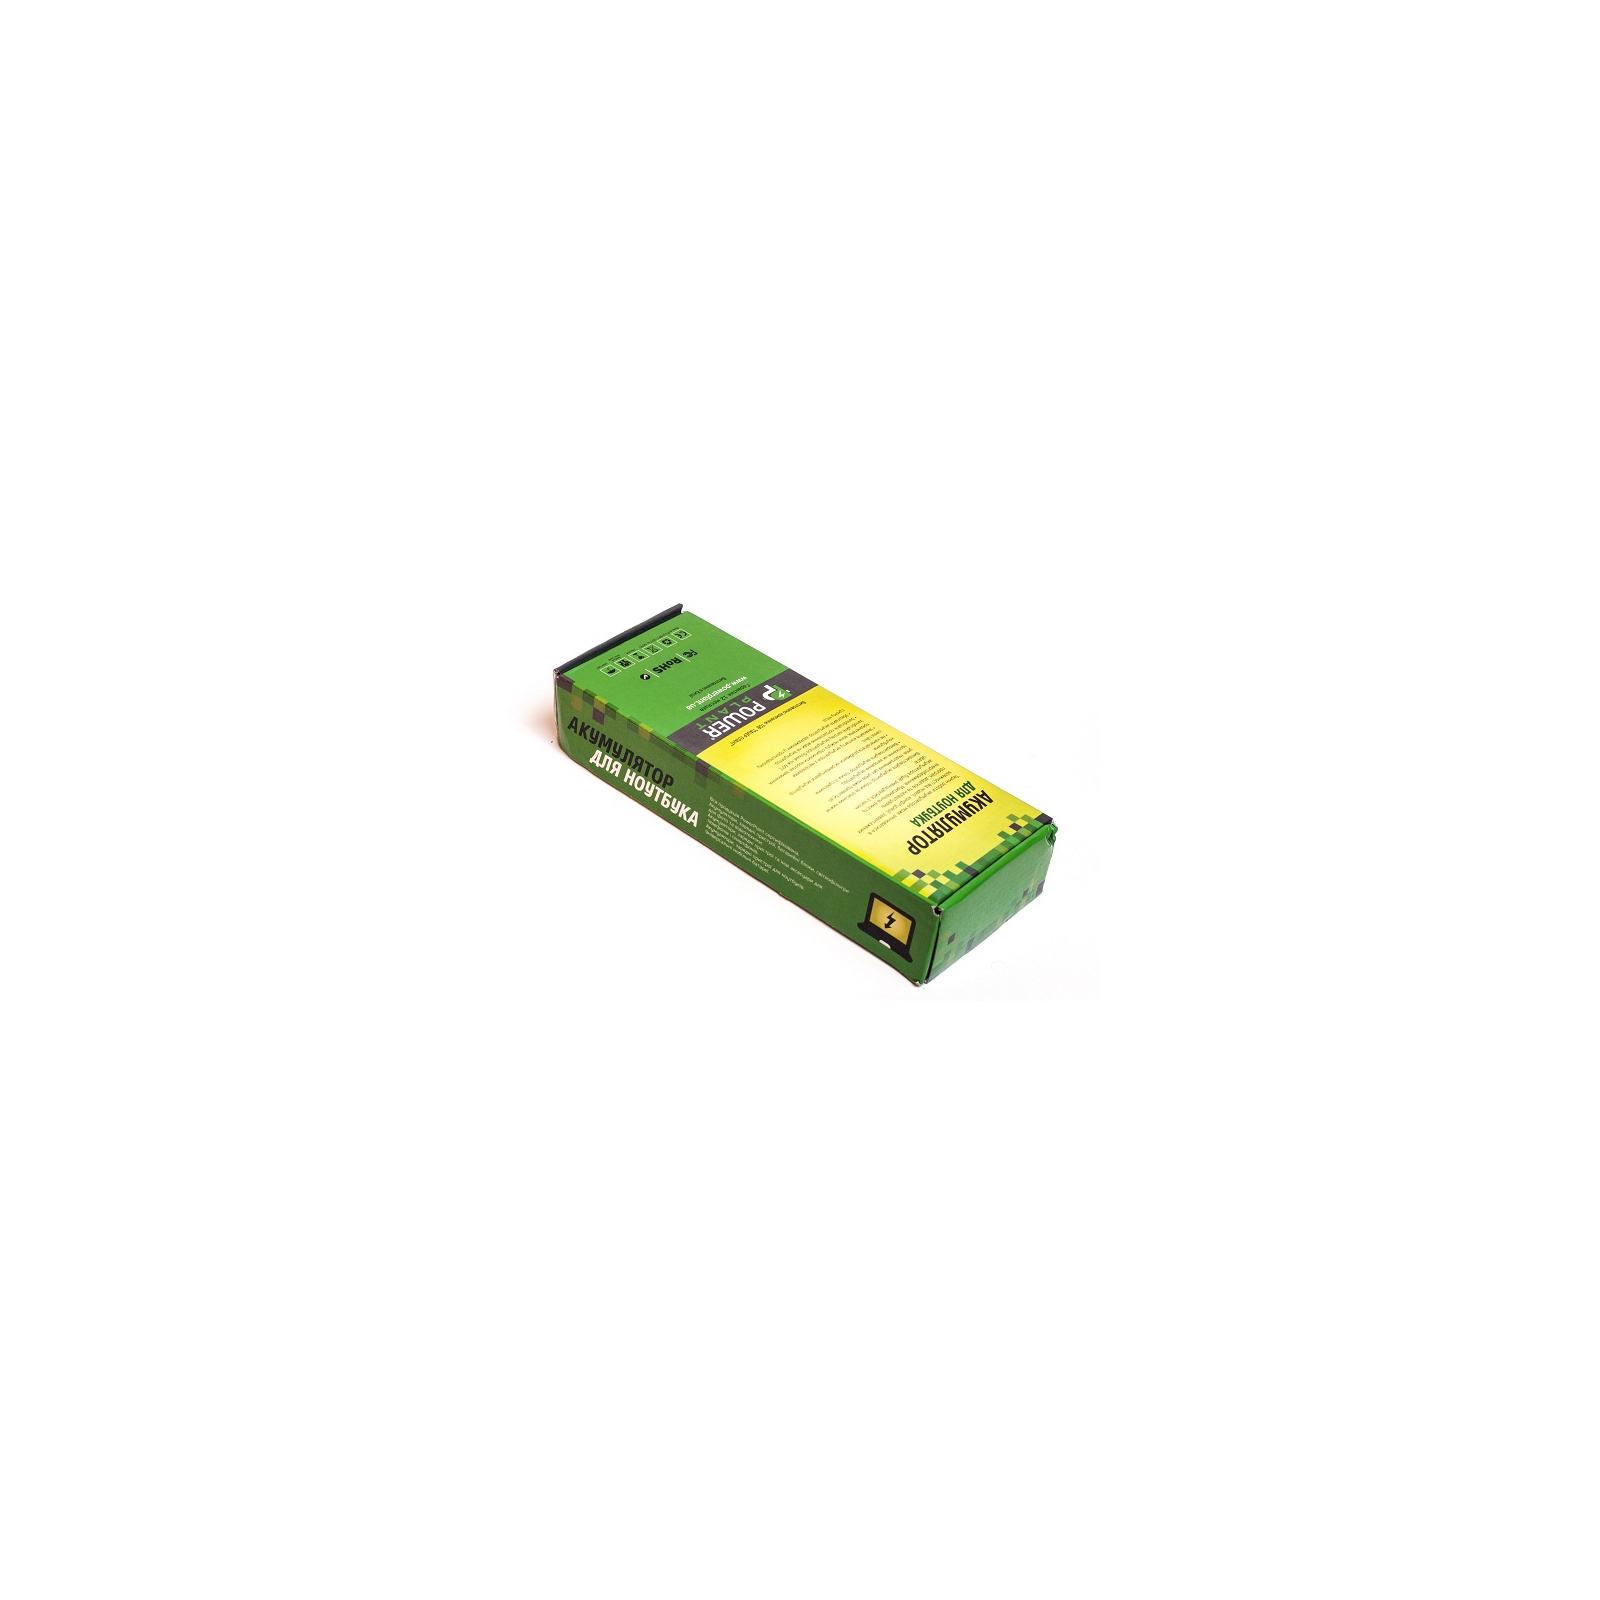 Аккумулятор для ноутбука LENOVO IdeaPad G460 (L09L6Y02 ,LE G460 3S2P) 11.1V 5200mAh PowerPlant (NB00000130) изображение 2